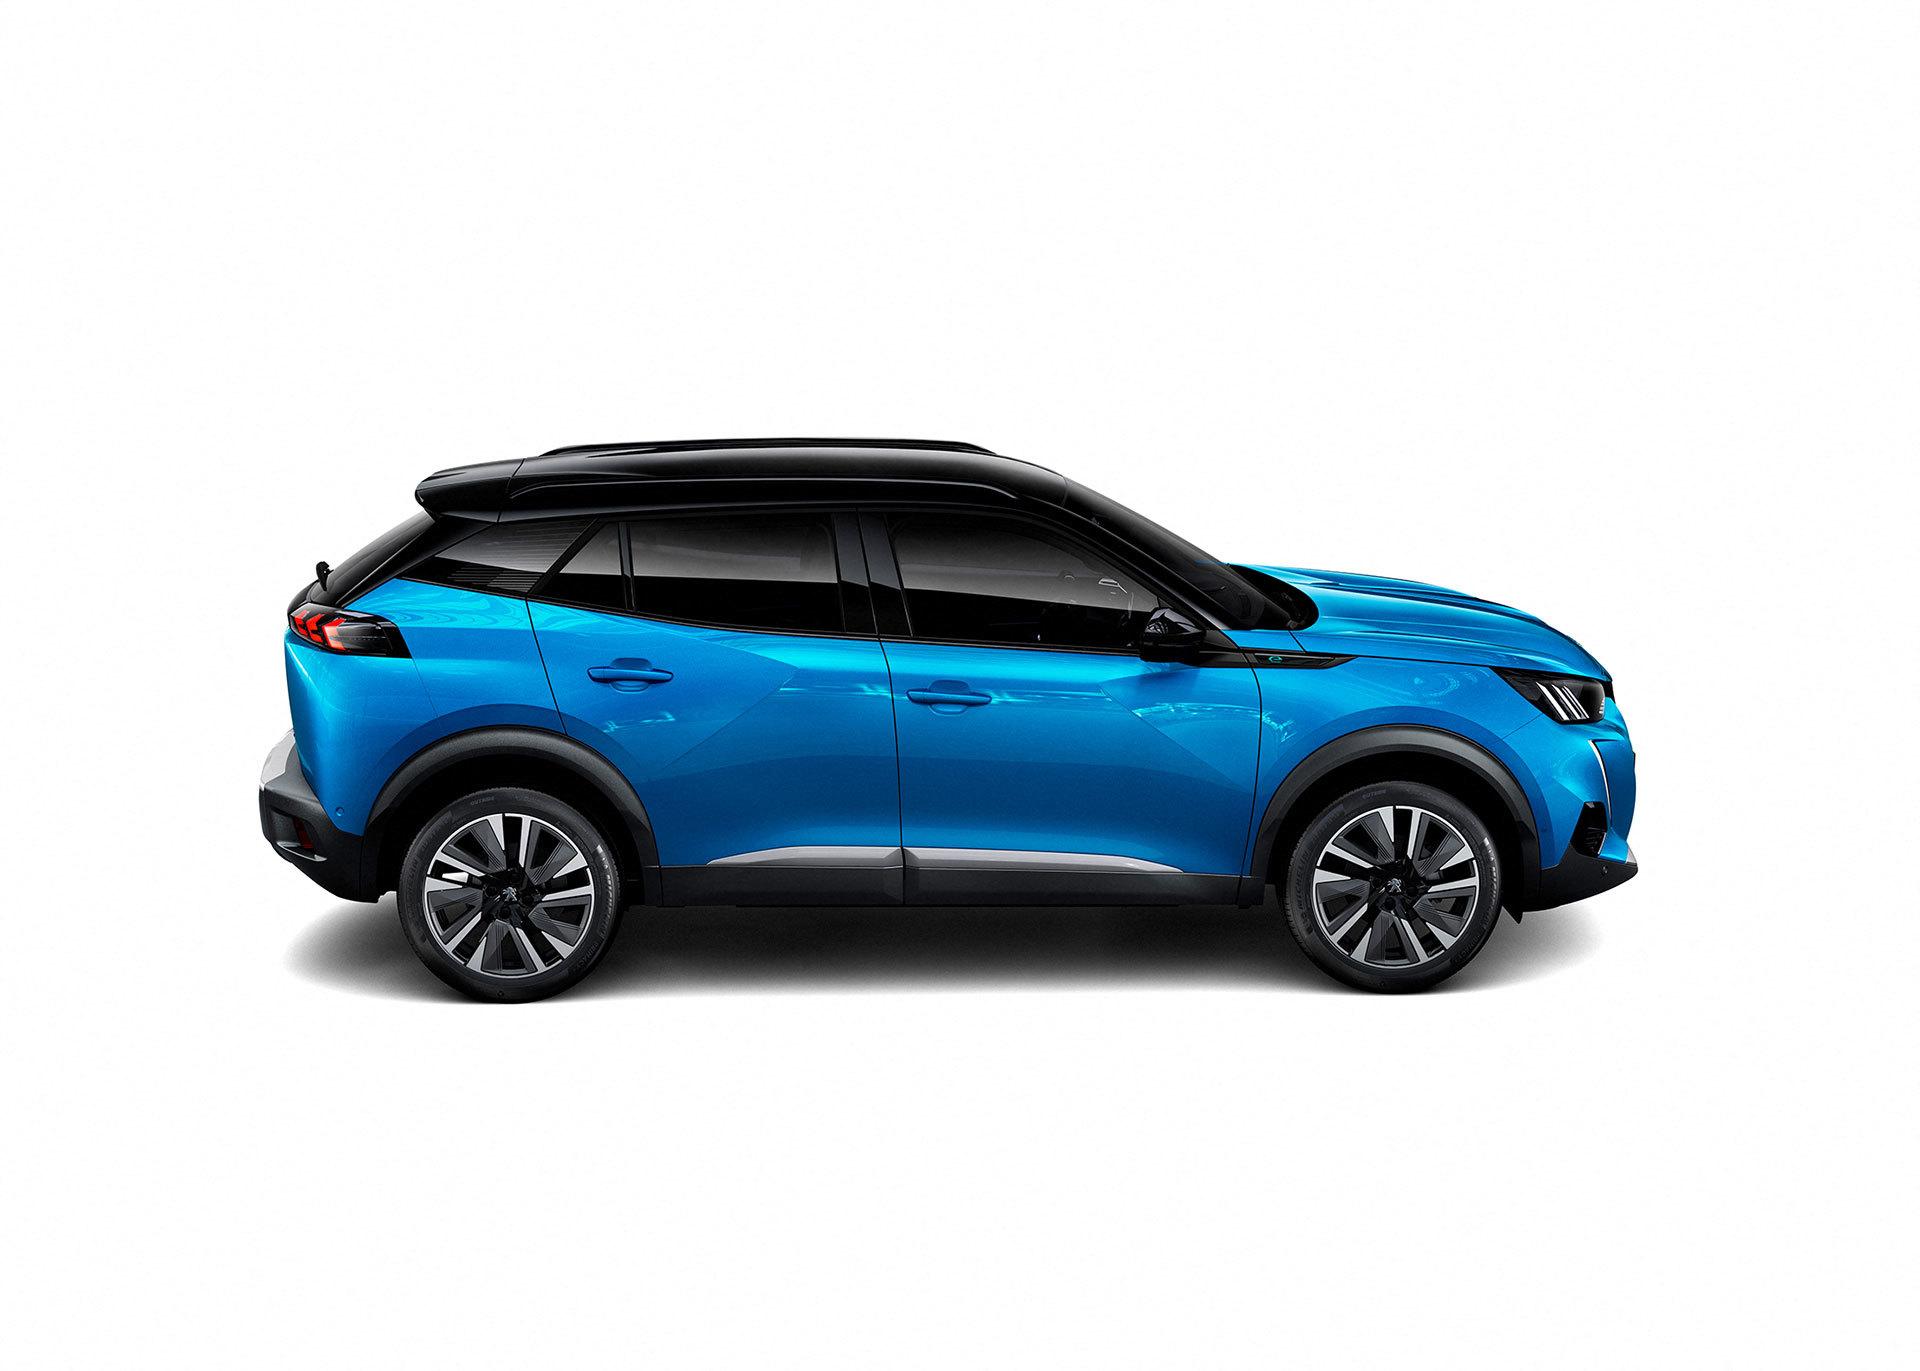 Peugeot 2008 Exterior Azul 2019 01